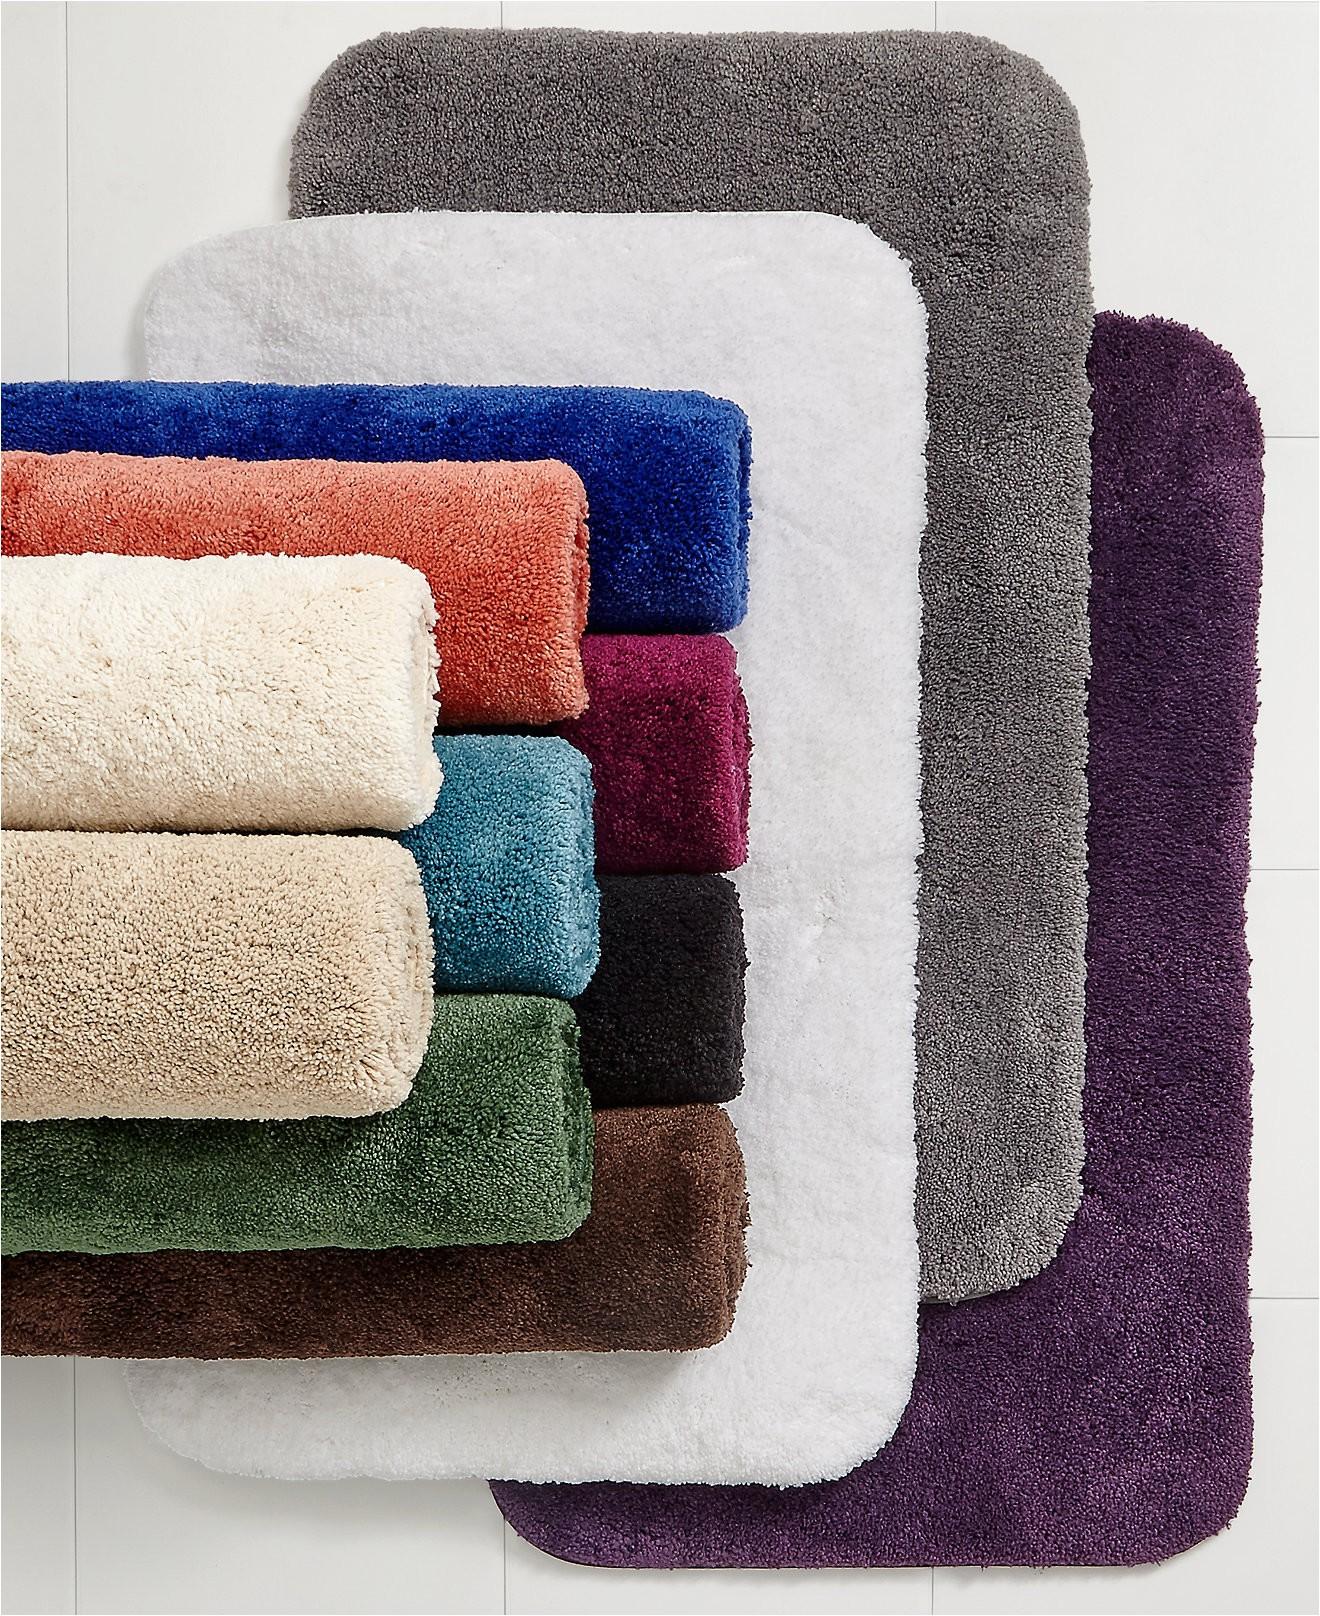 small bath rug in twelve option colors costco bath rugs pottery barn bath rugs bed bath beyond area rugs macys bath towels blue rugs tar mohawk memory foam bath mat shag bathroom rugs jcpenney rugs